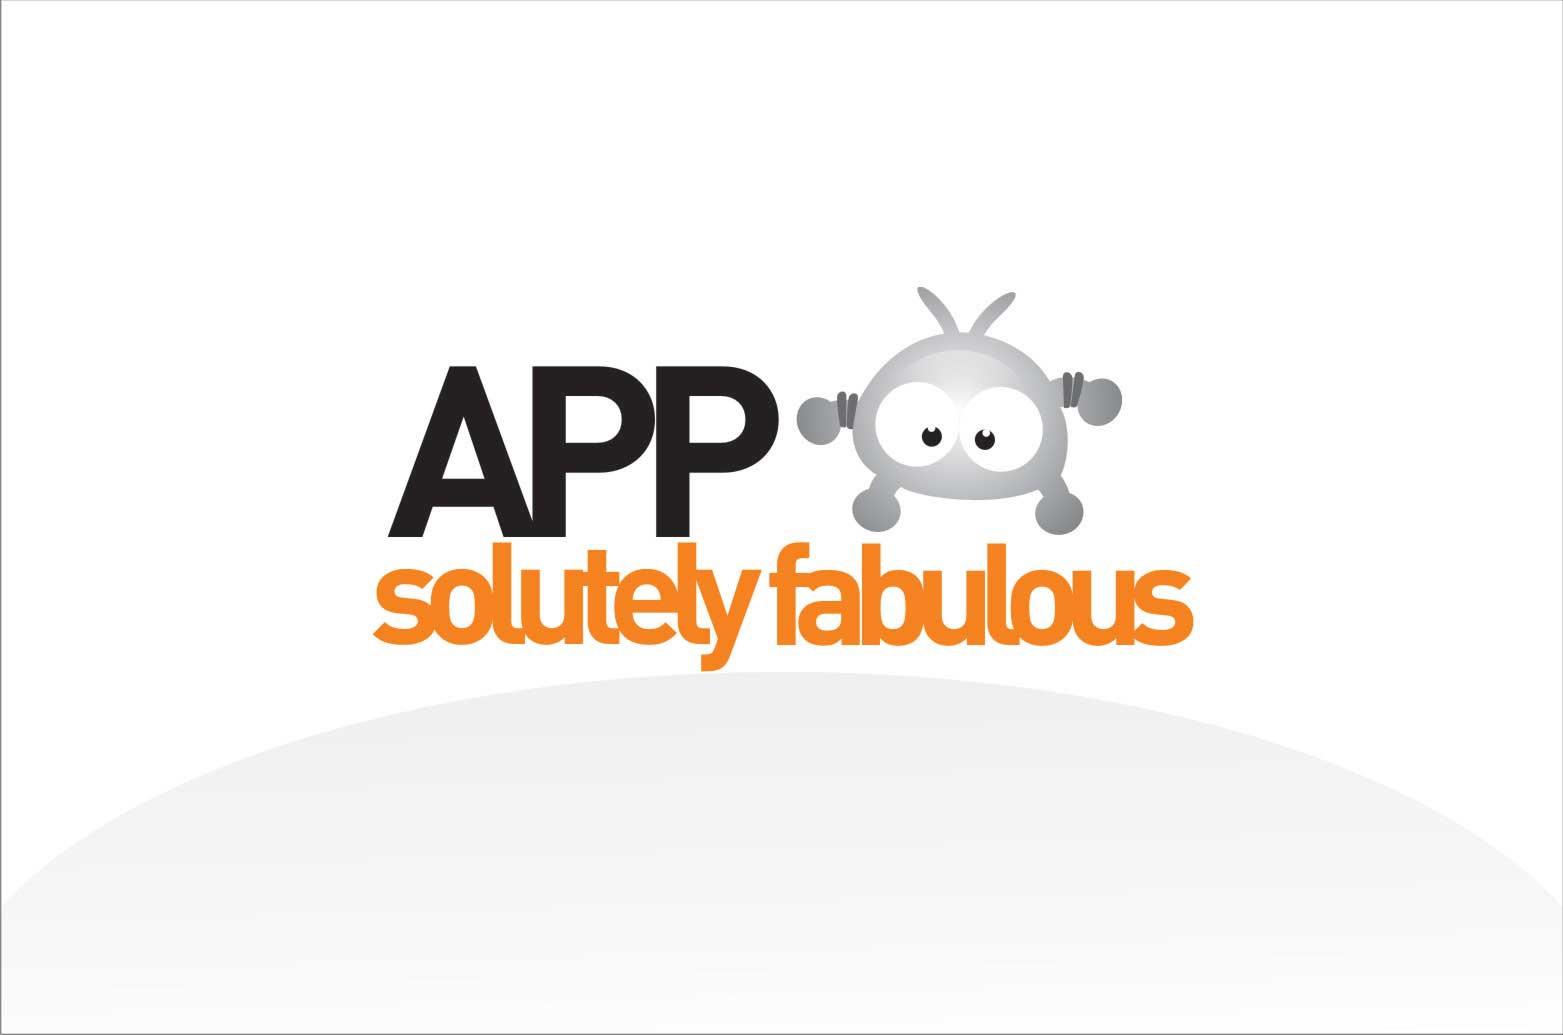 APPsolutely Fabulous needs a new logo